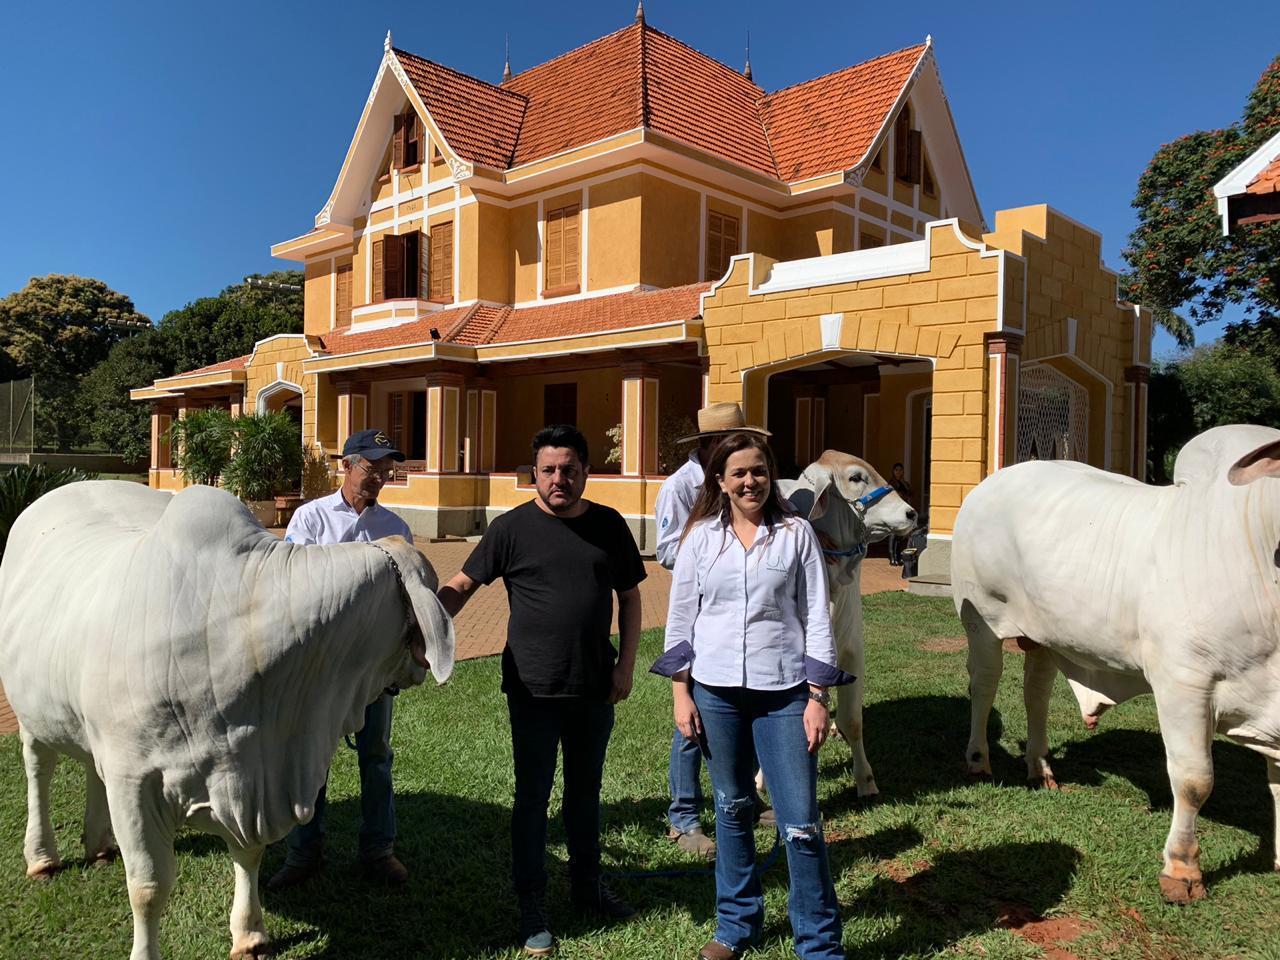 Bruno, da dupla Bruno & Marrone, visita Fazenda Água Milagrosa, berço da raça Tabapuã 41